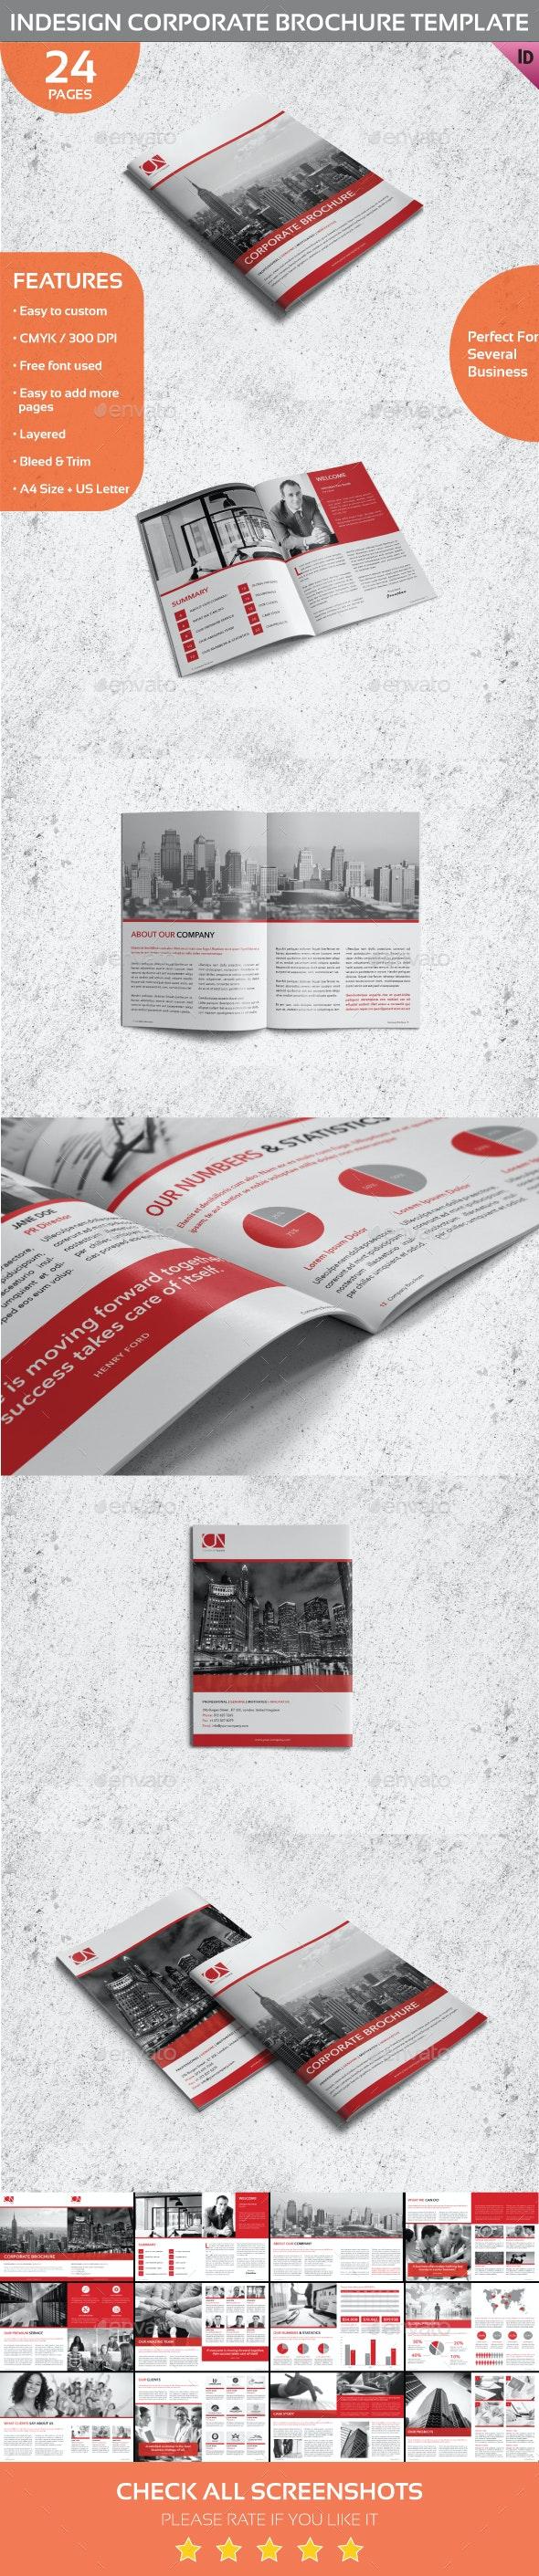 Indesign Corporate Brochure Template - Corporate Brochures